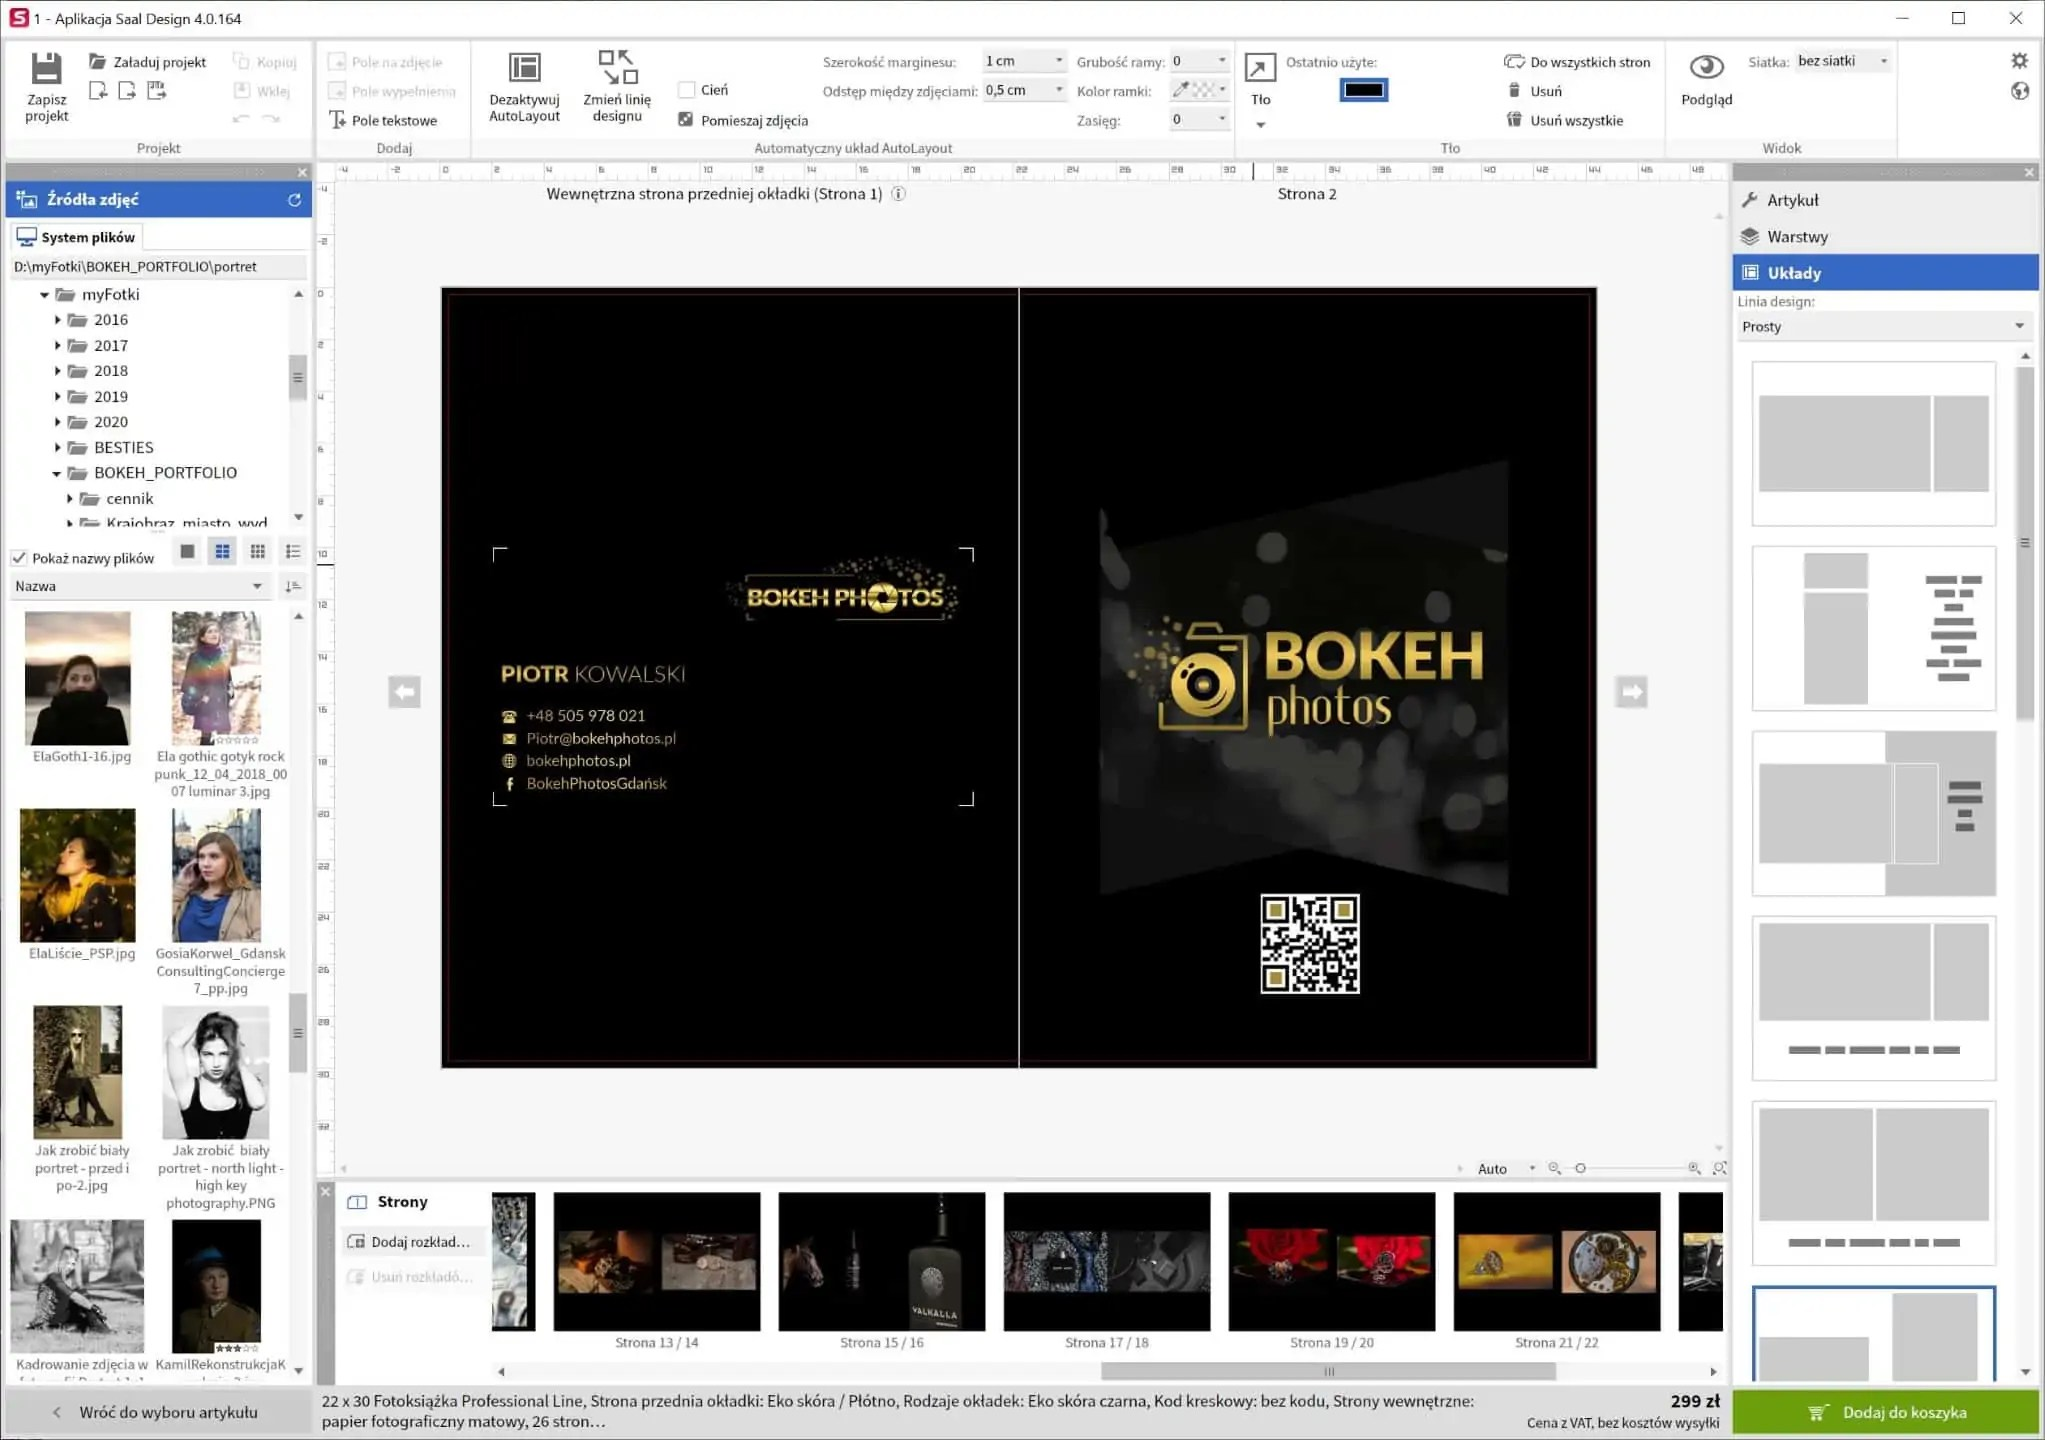 saal digital program do projektowania fotoksiążki - Saal design, pixbook - książki fotograficzne